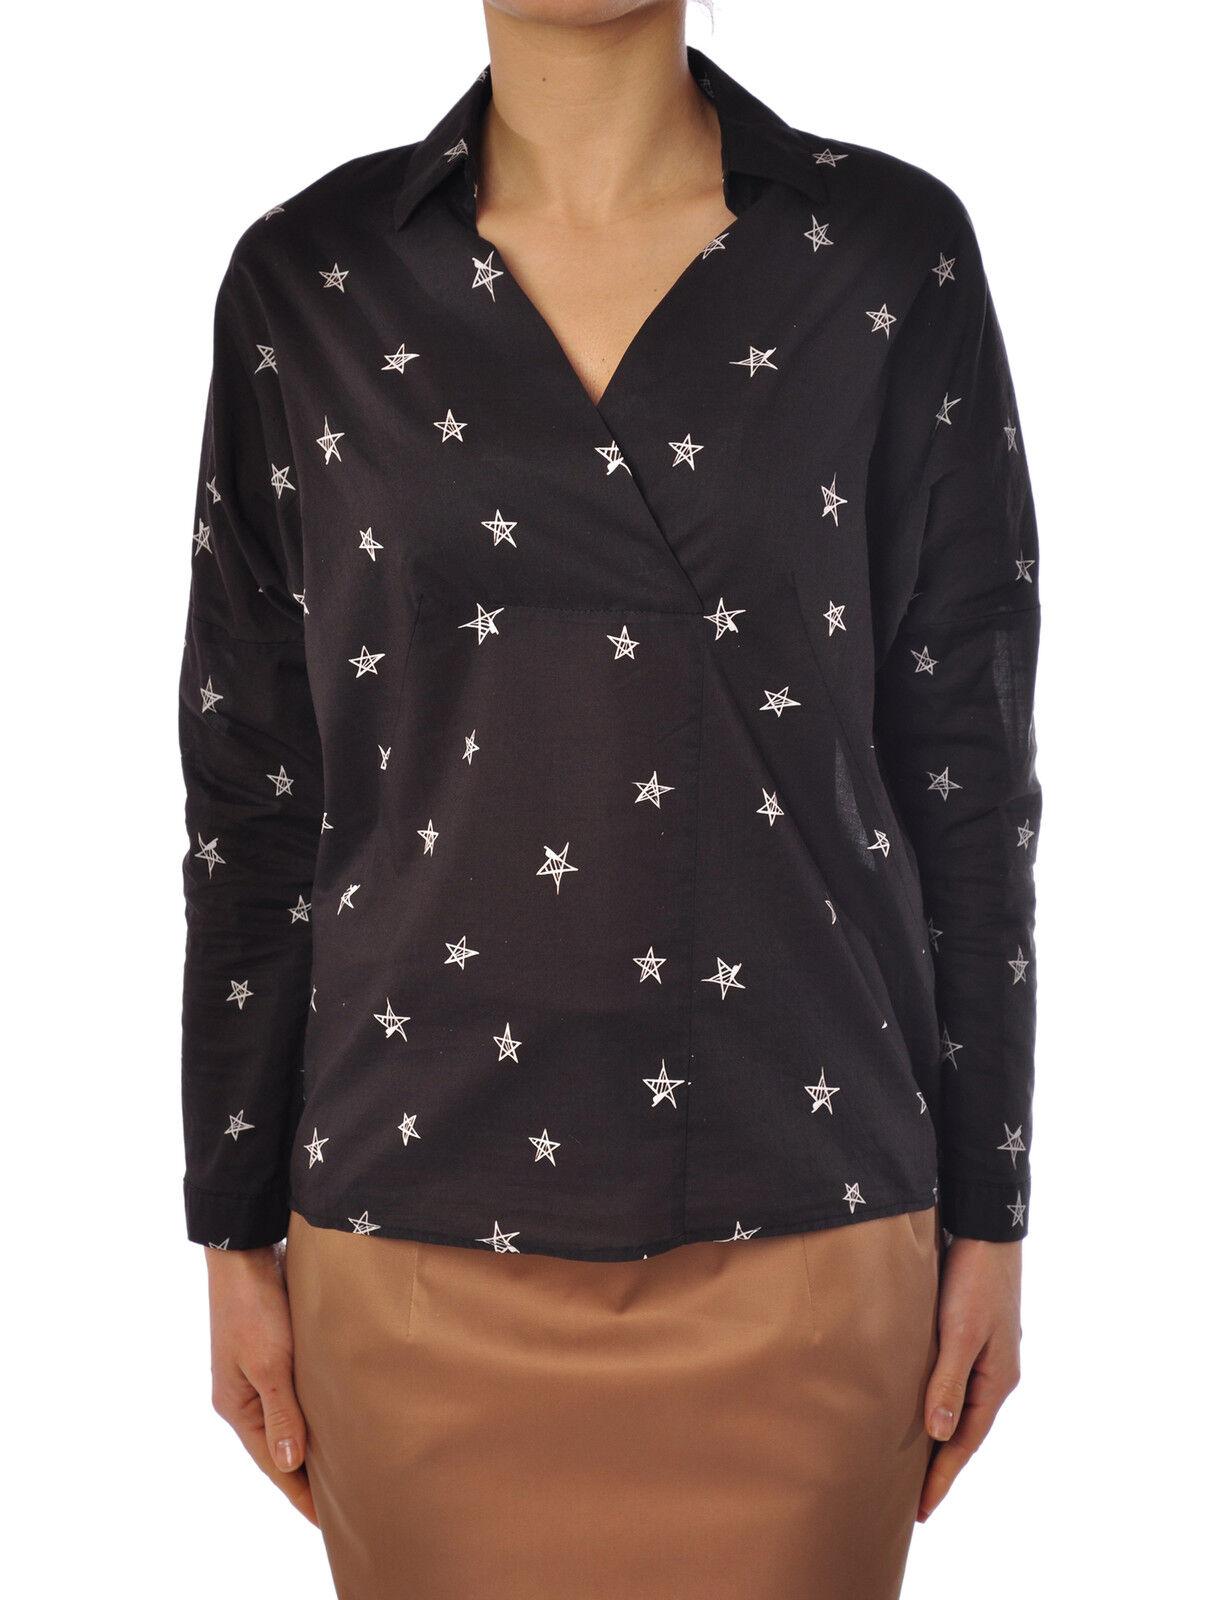 Mercì  -  Shirt - Female - XS - schwarz - 1703111C164036